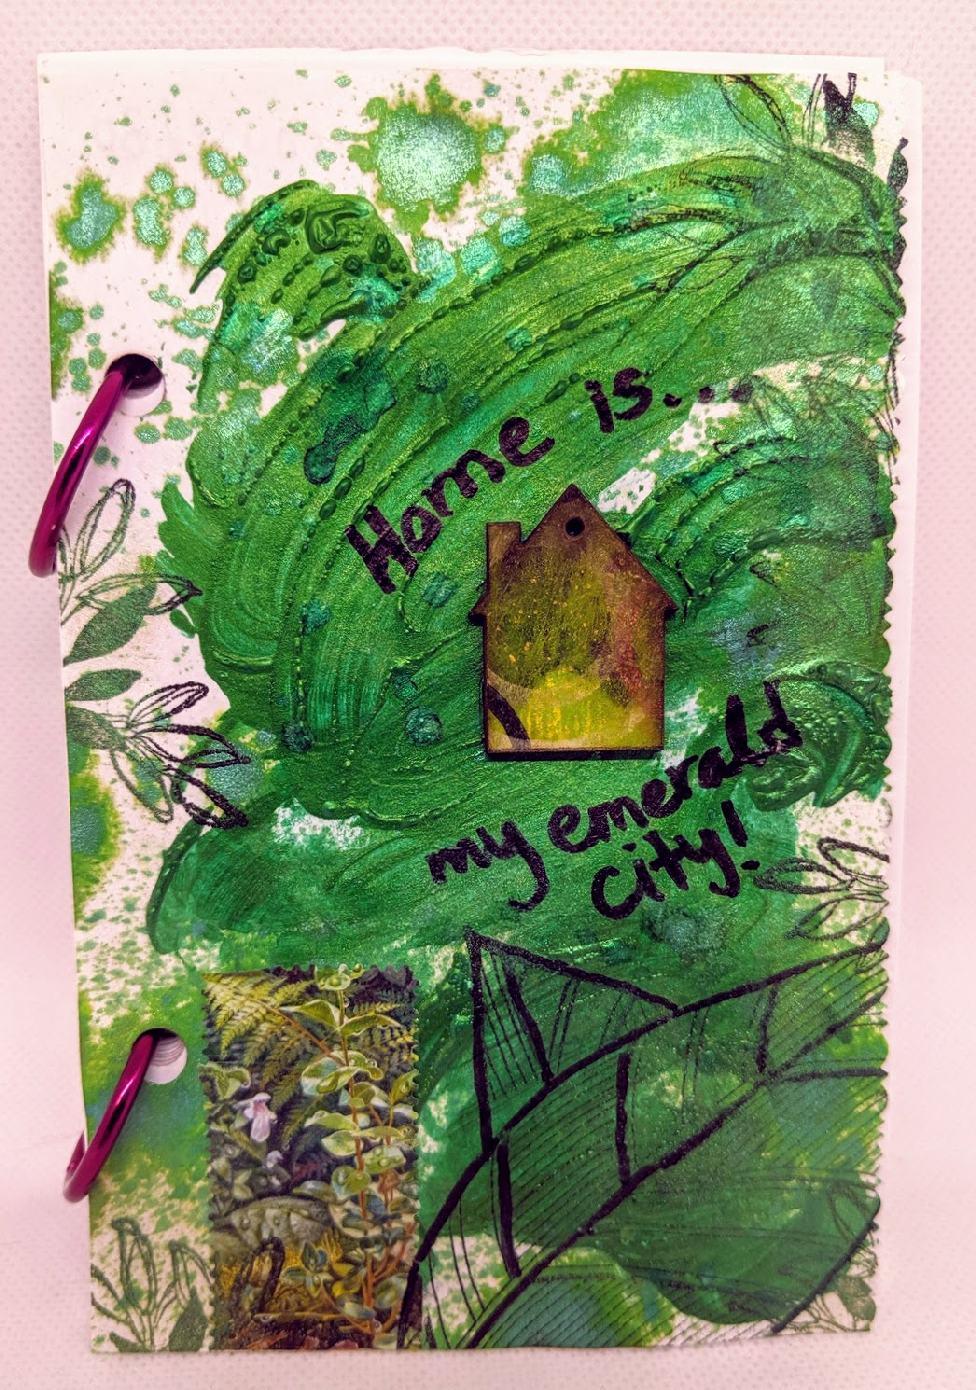 198: Prompt 3 - Emerald